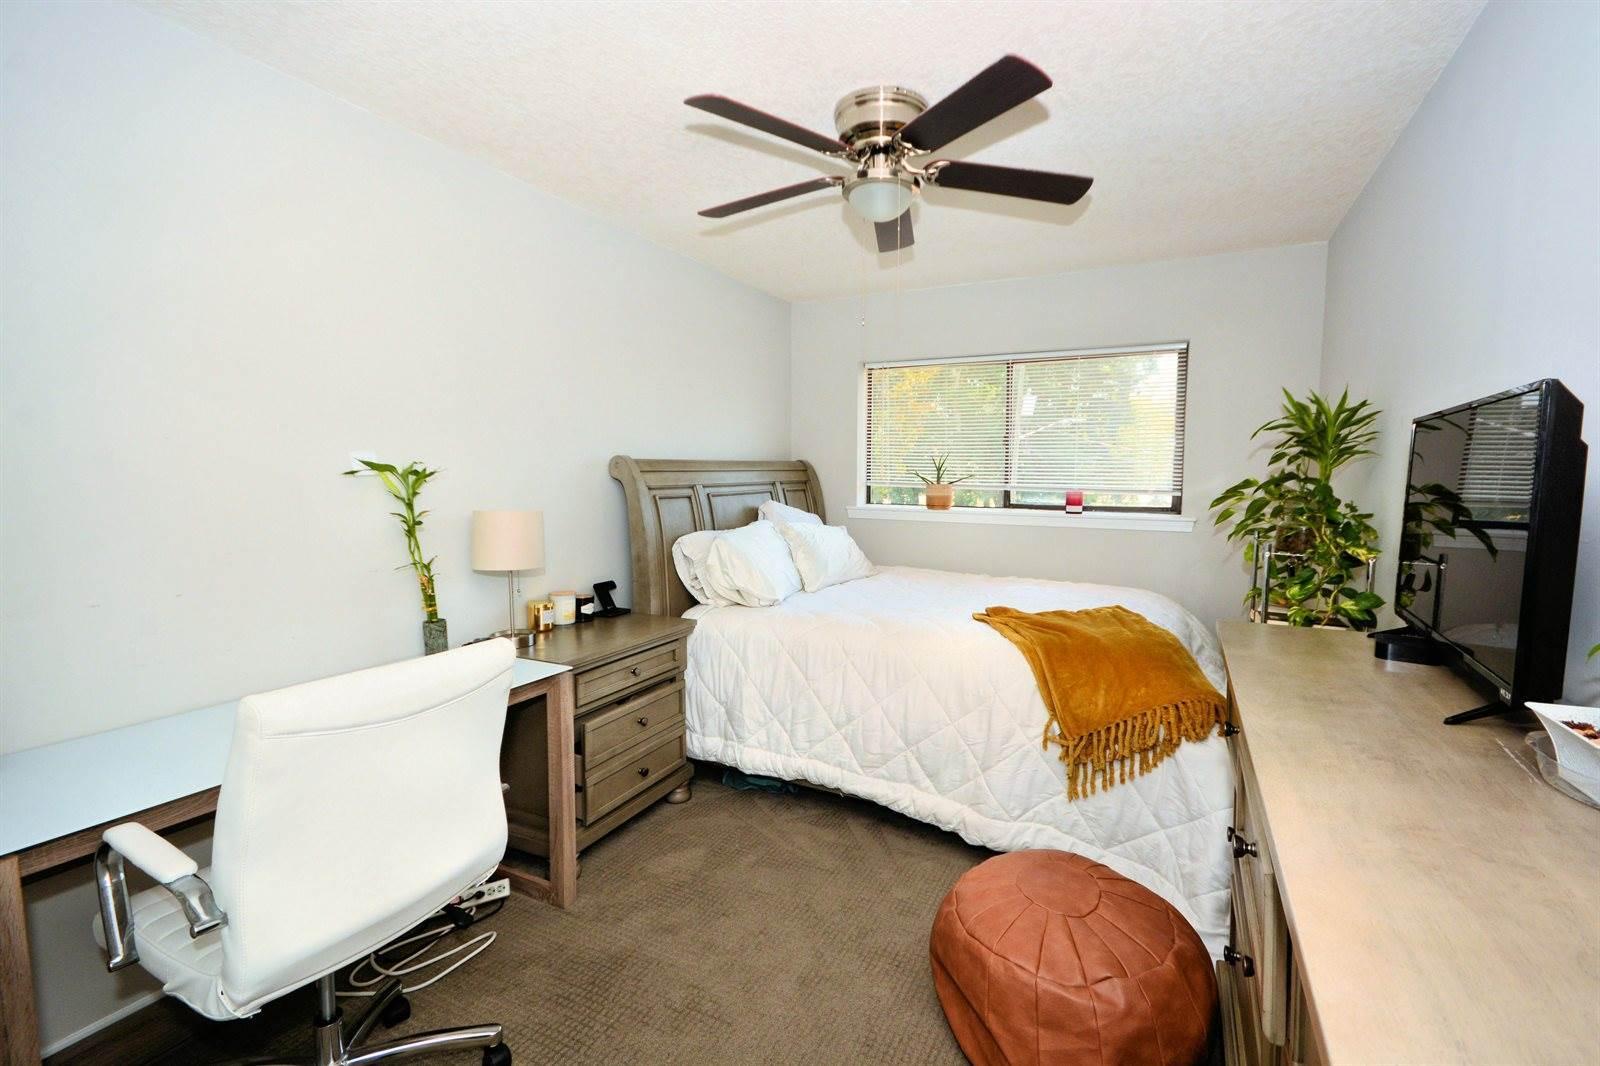 739 Egret Bluff Ln, Jacksonville, FL 32211